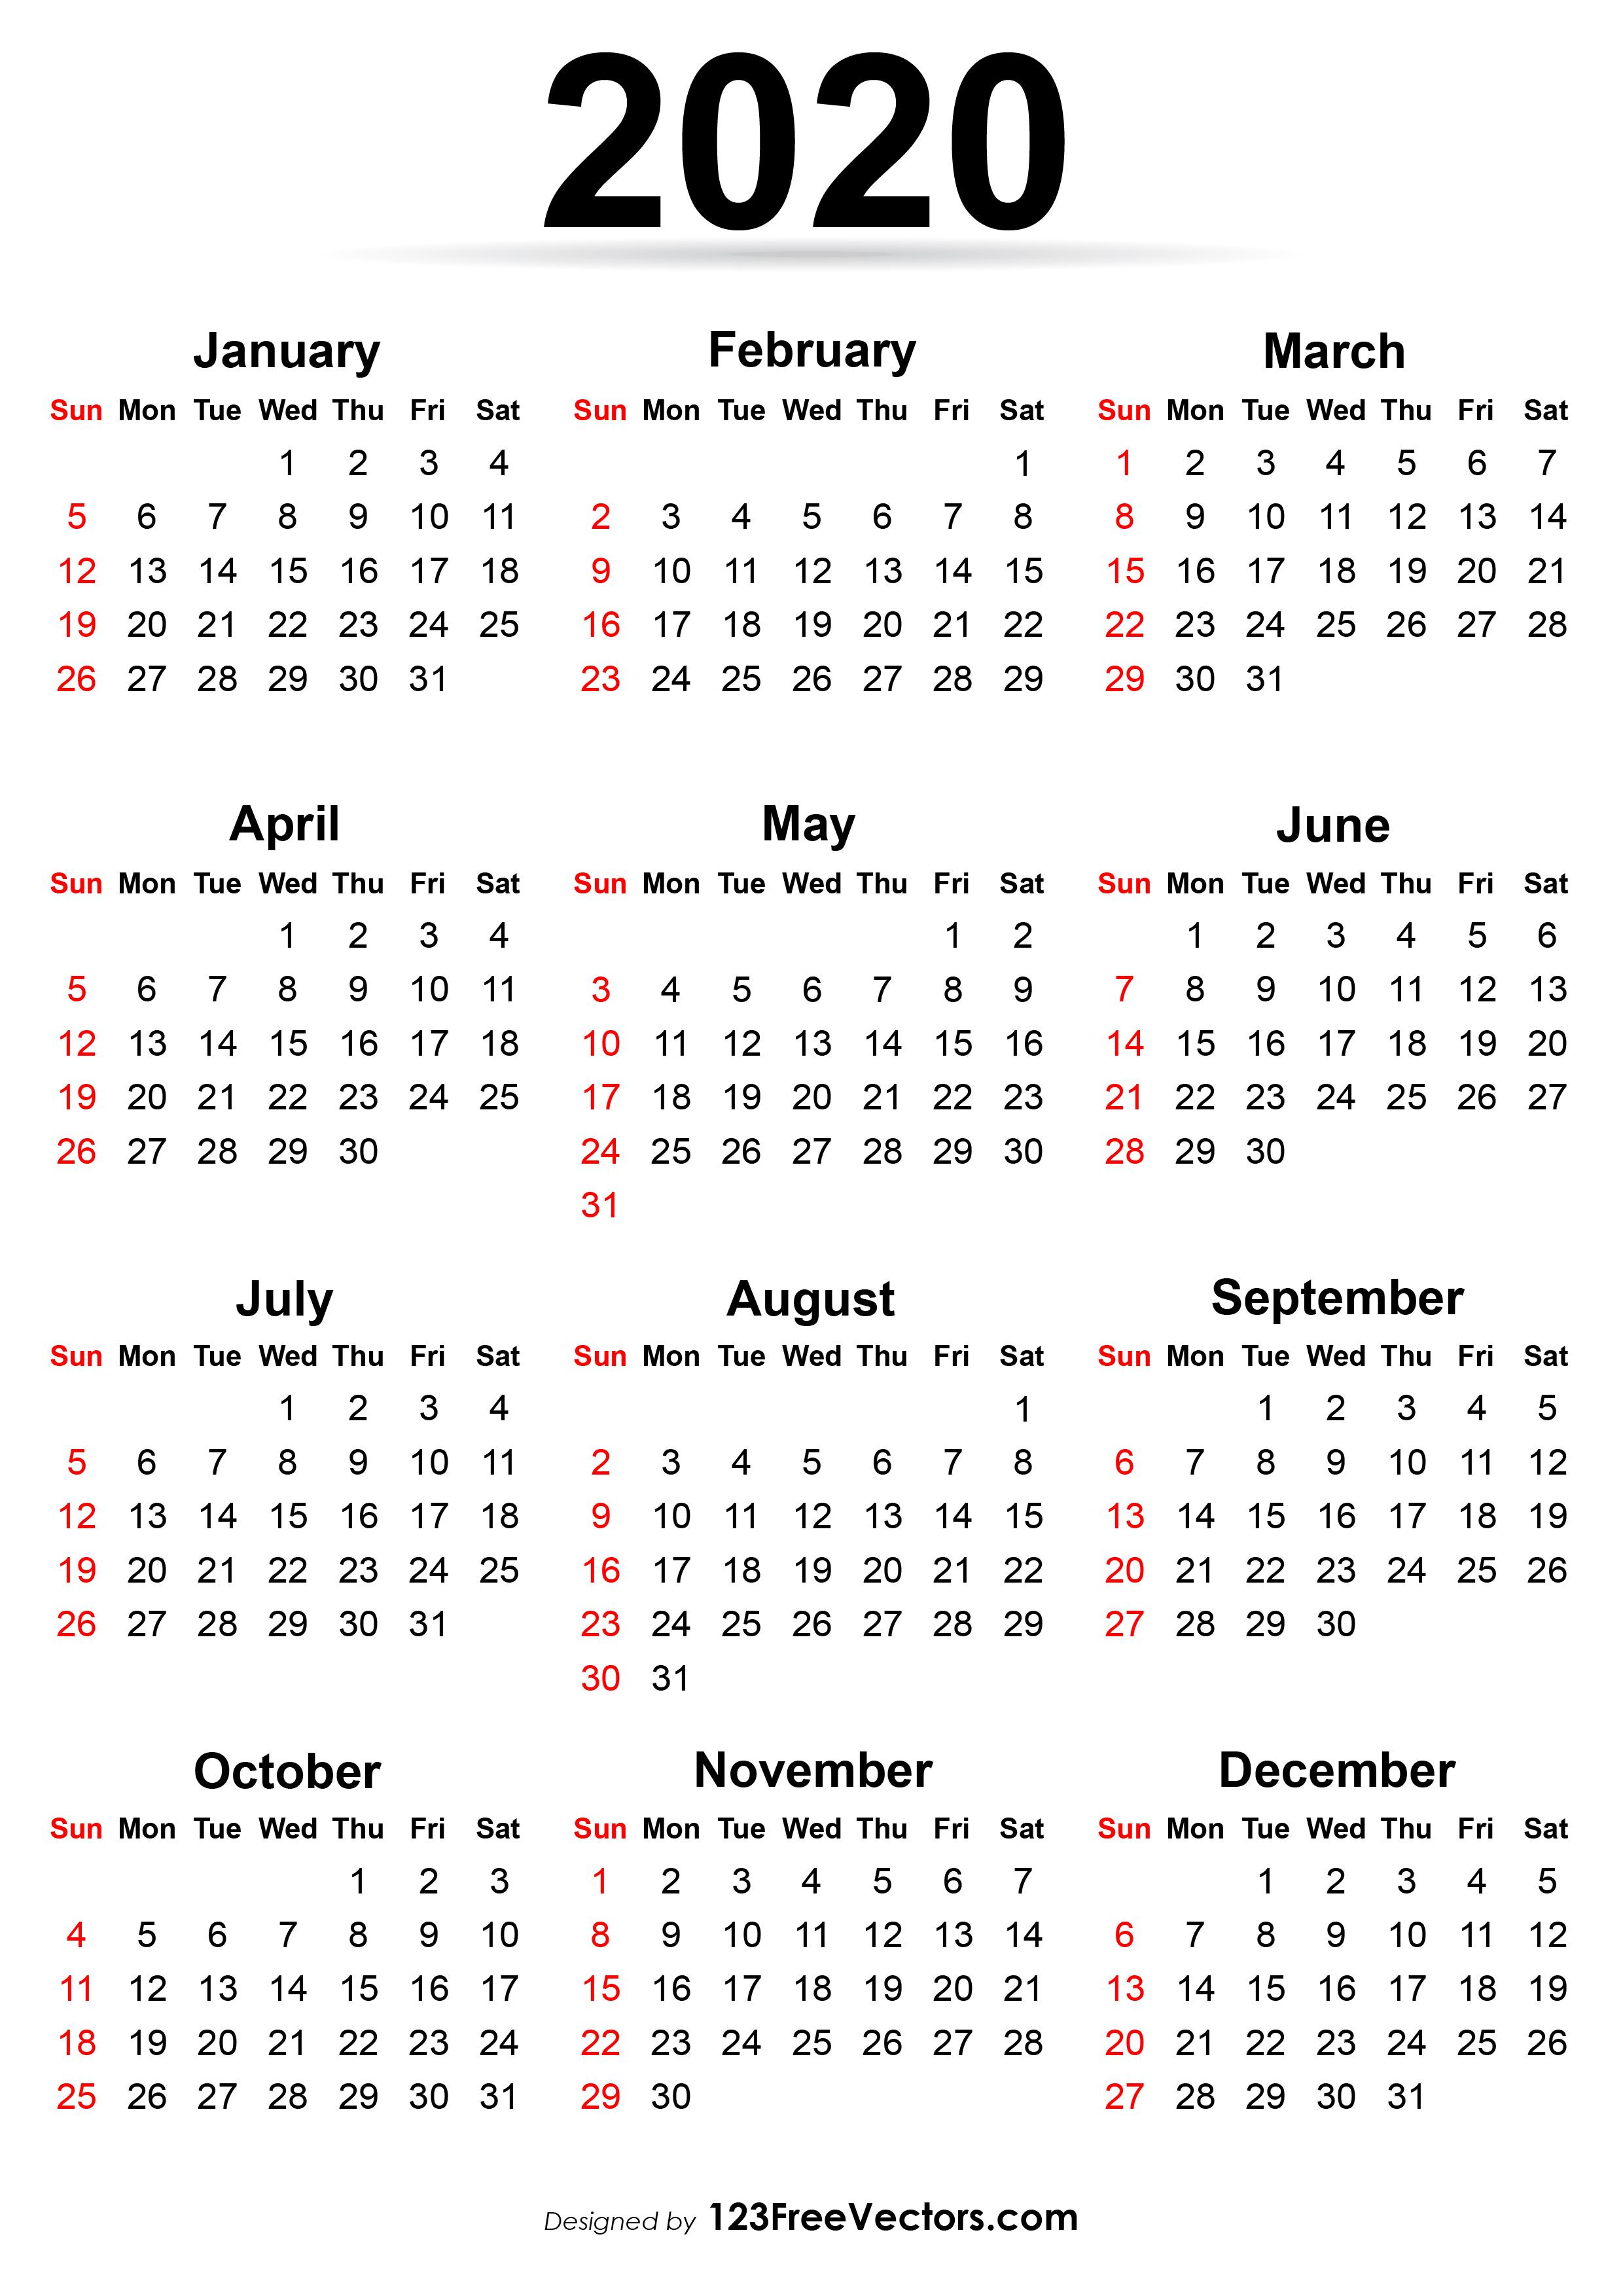 2020 Calendar Printable.Printable Calendar 2020